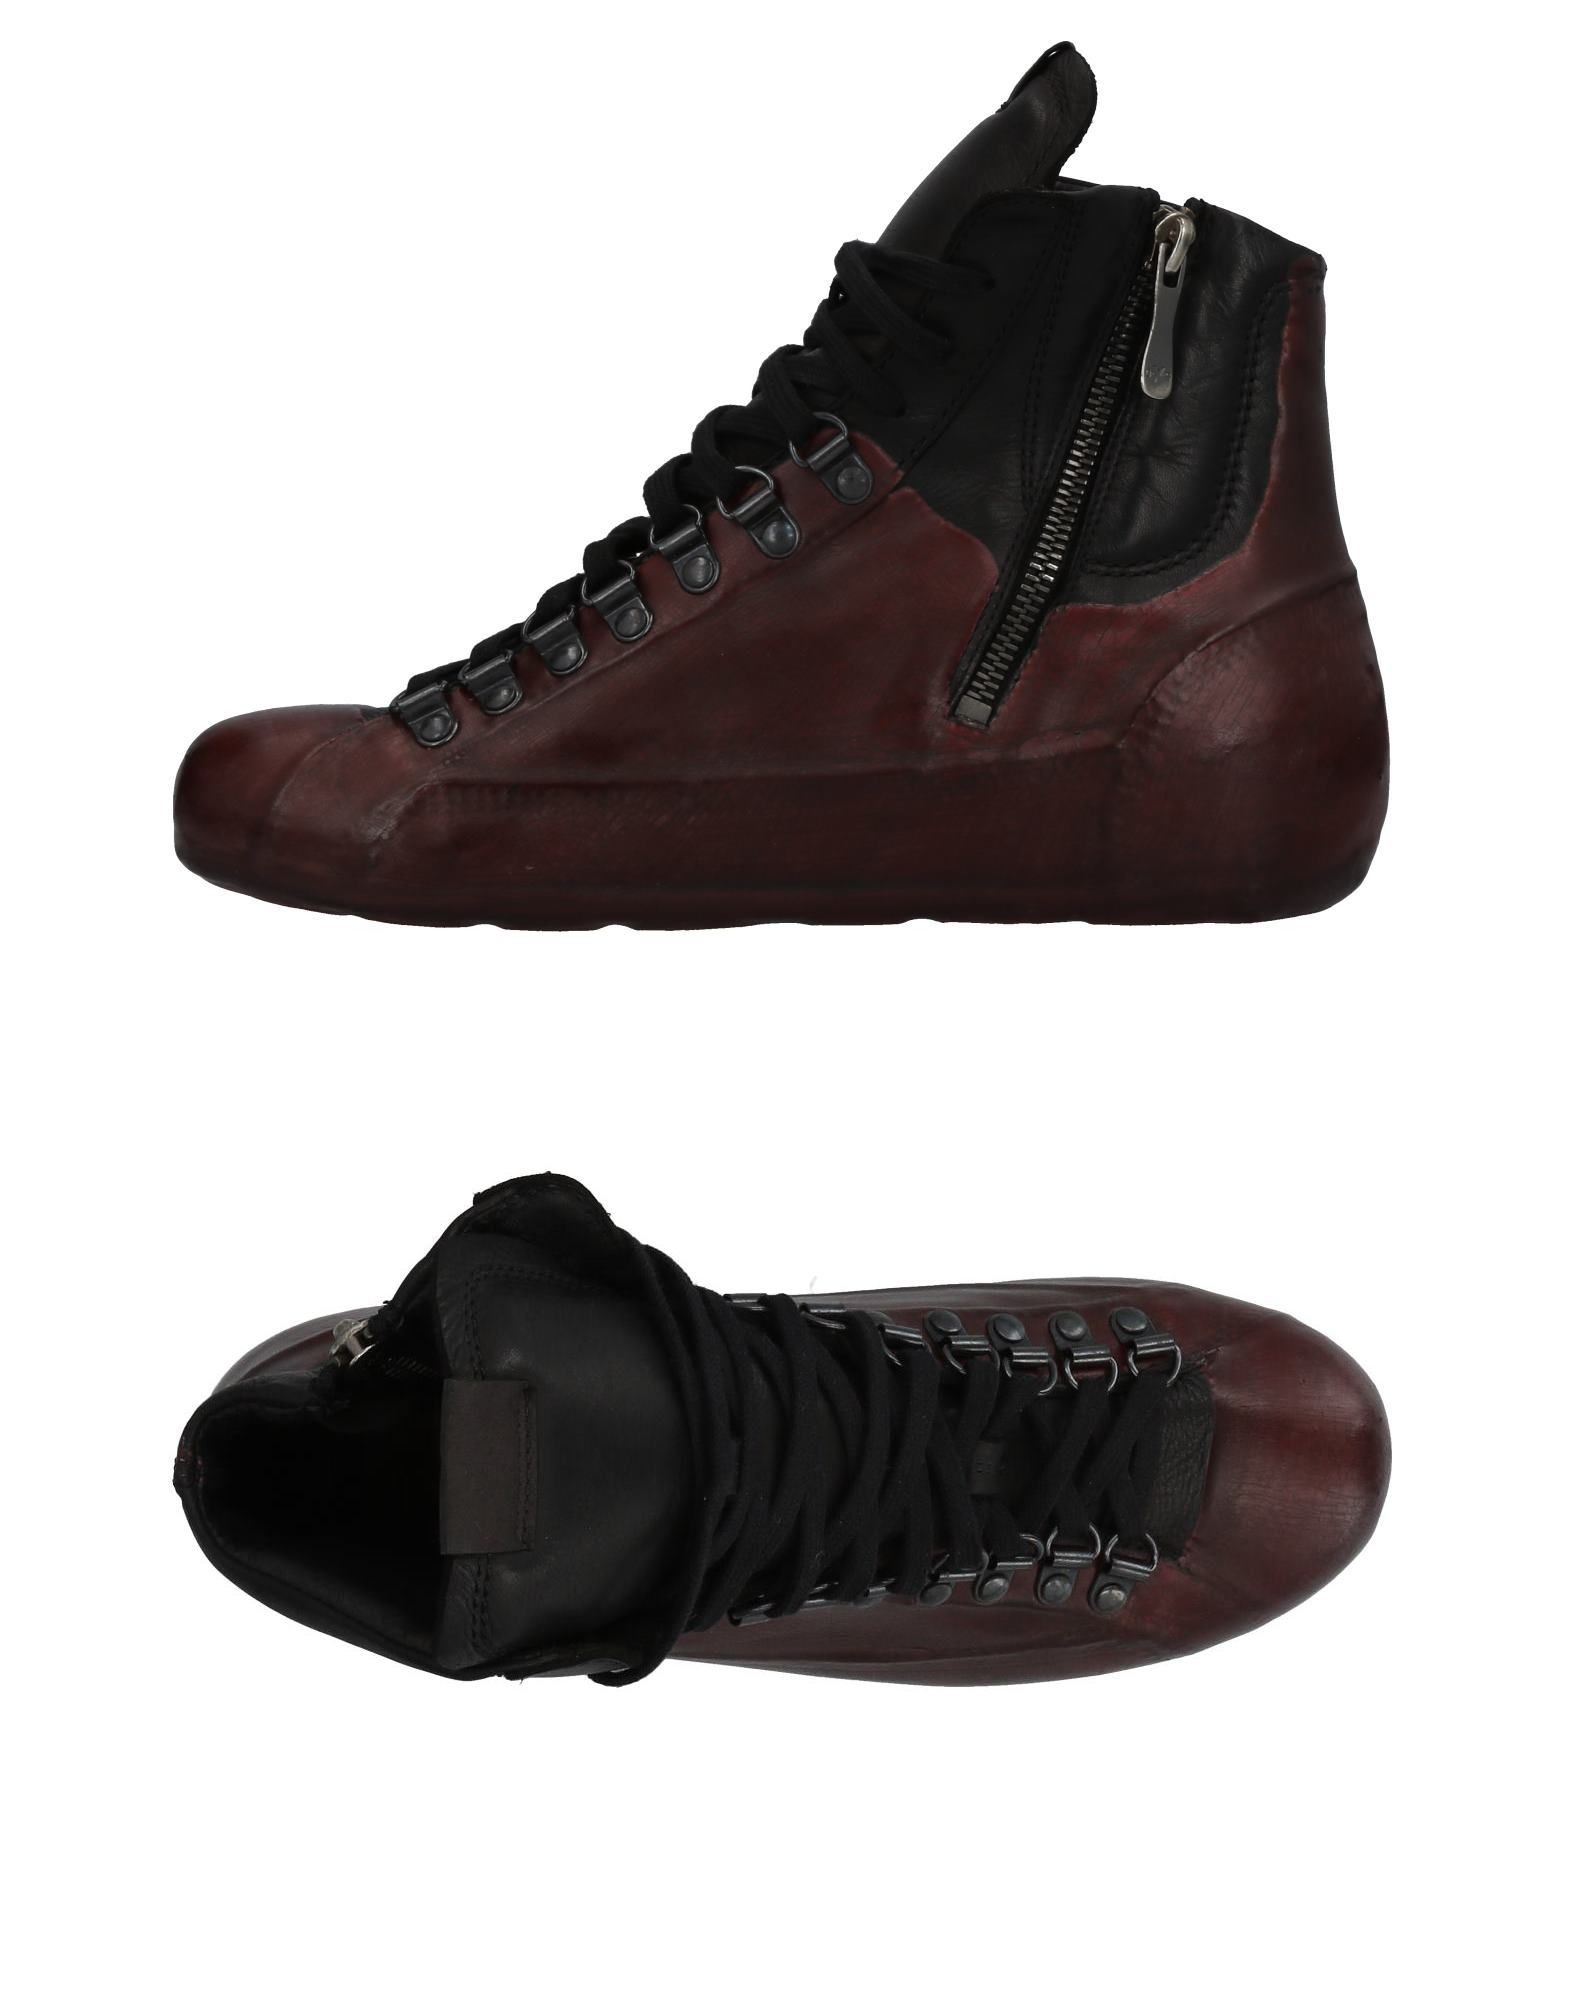 Rabatt Schuhe Damen O.X.S. Rubber Soul Sneakers Damen Schuhe  11459644JE 44f893